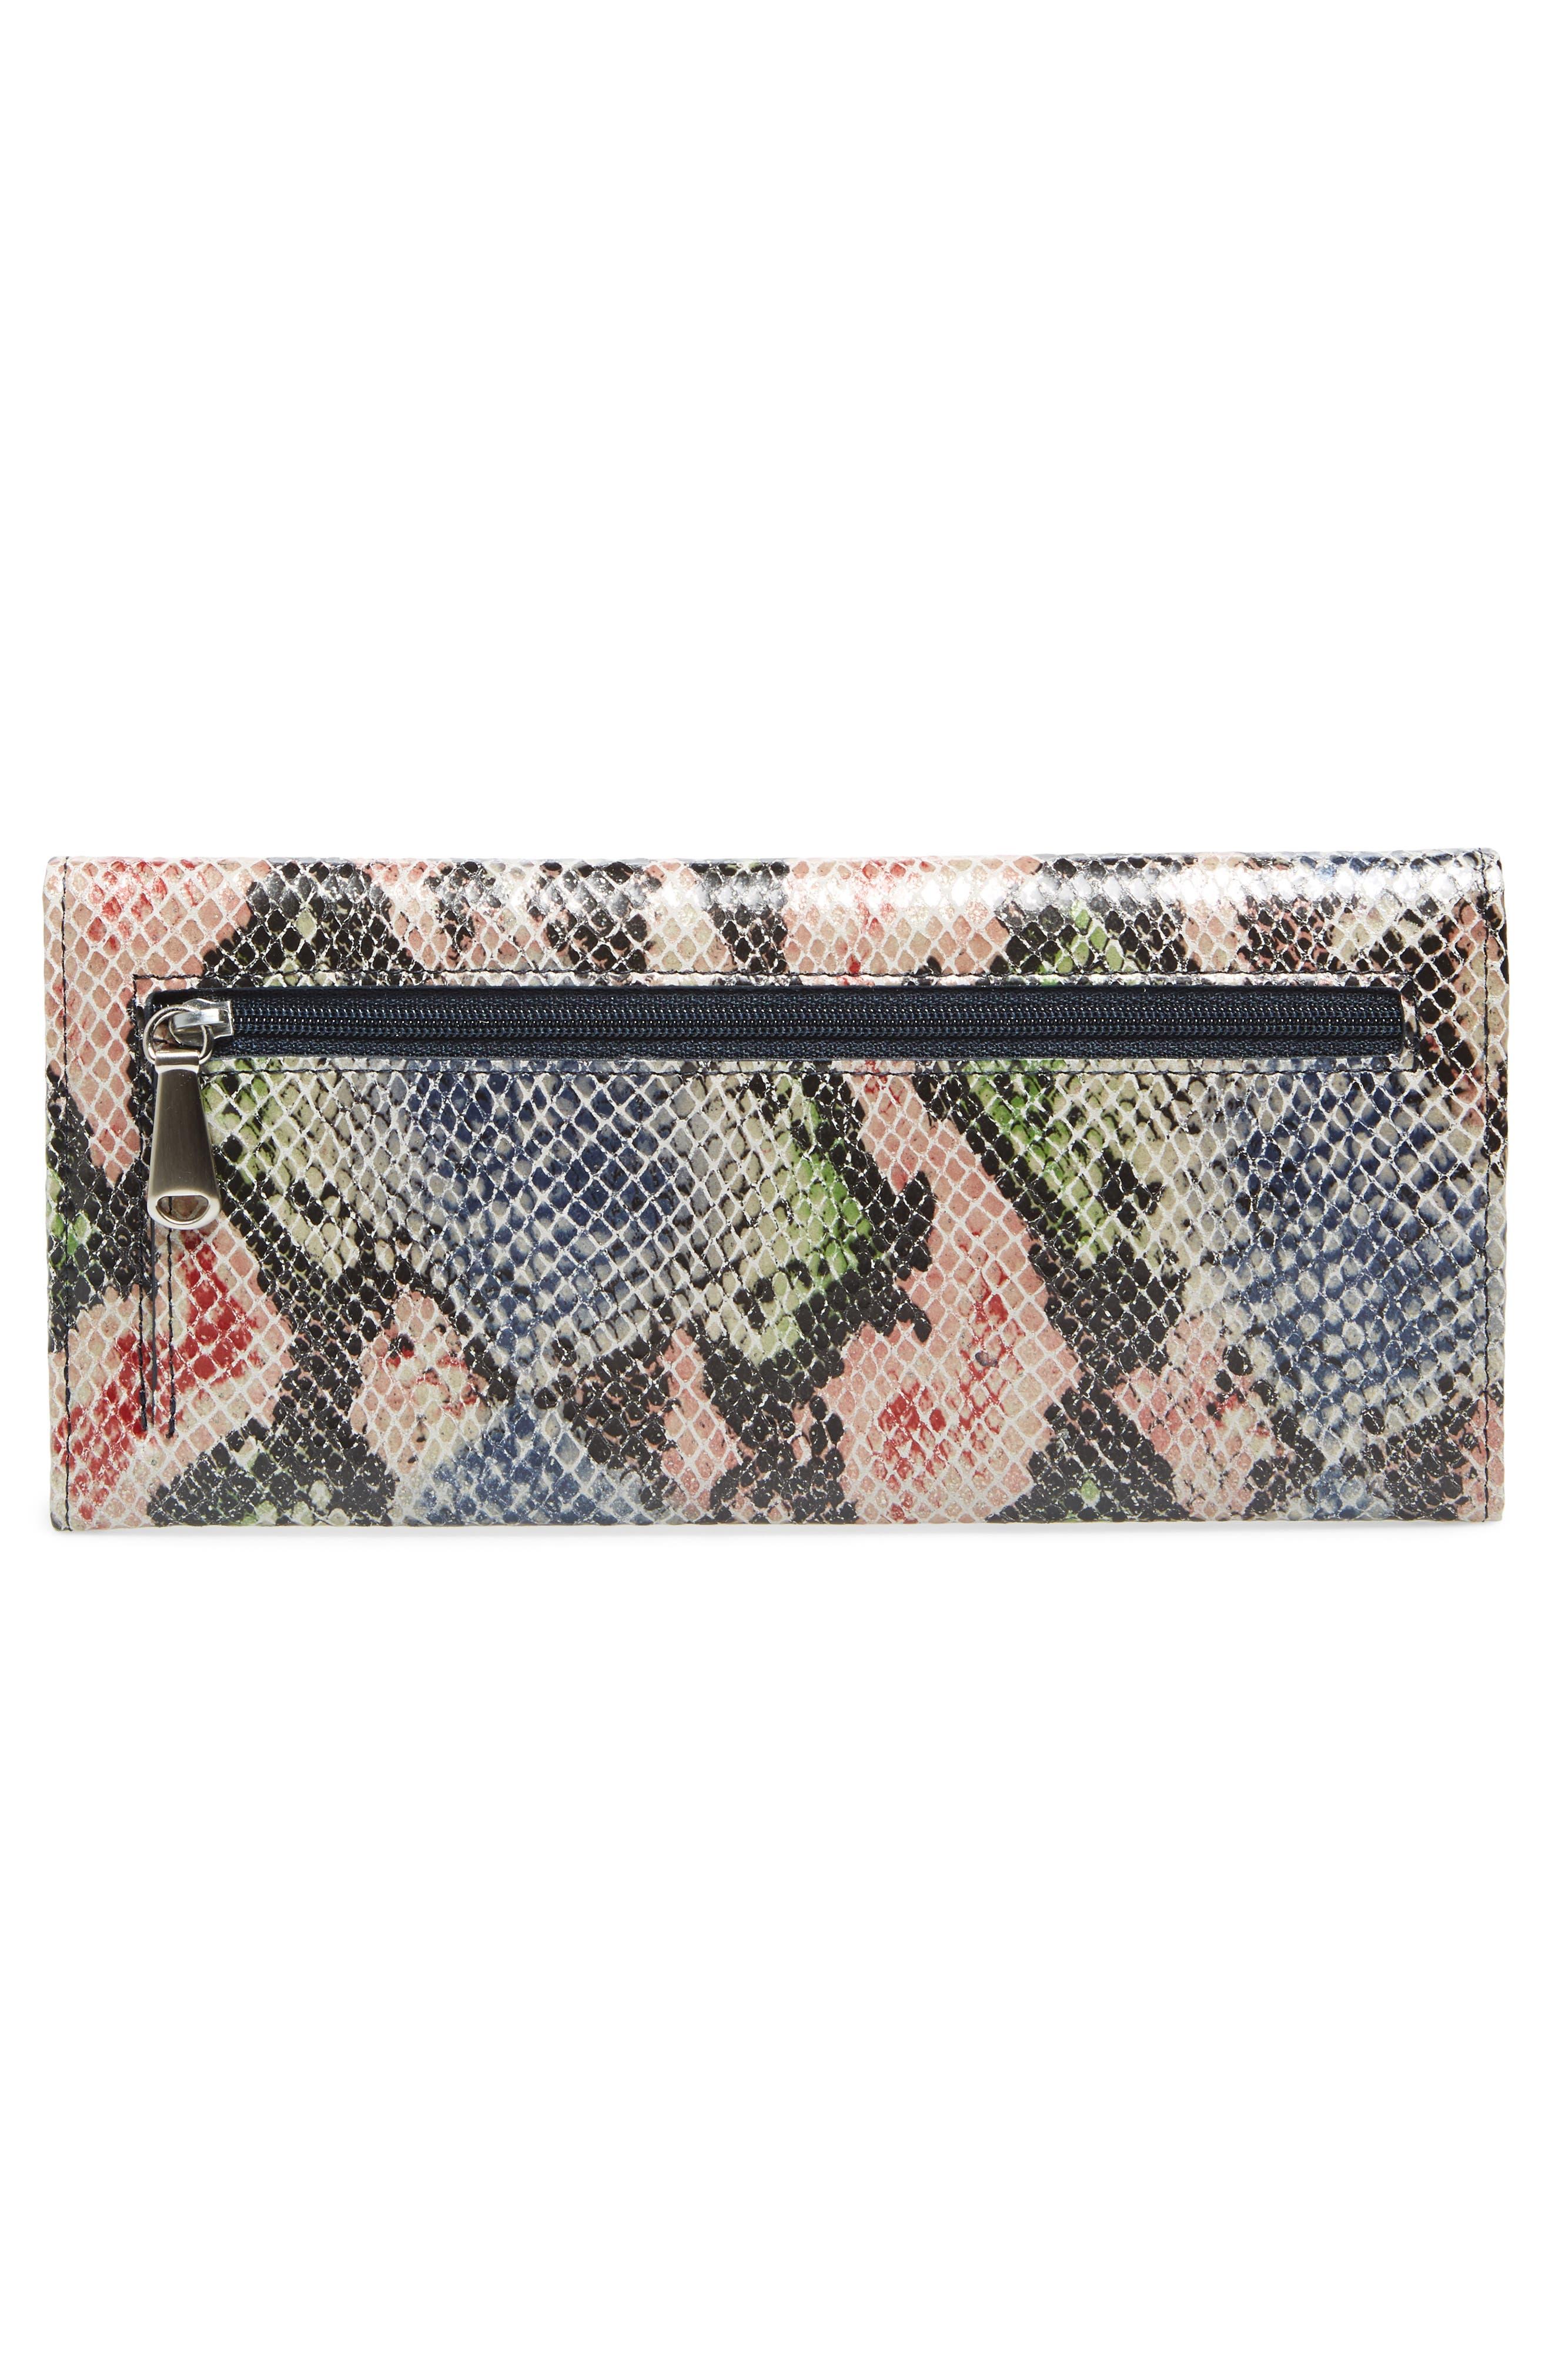 'Sadie' Leather Wallet,                             Alternate thumbnail 111, color,